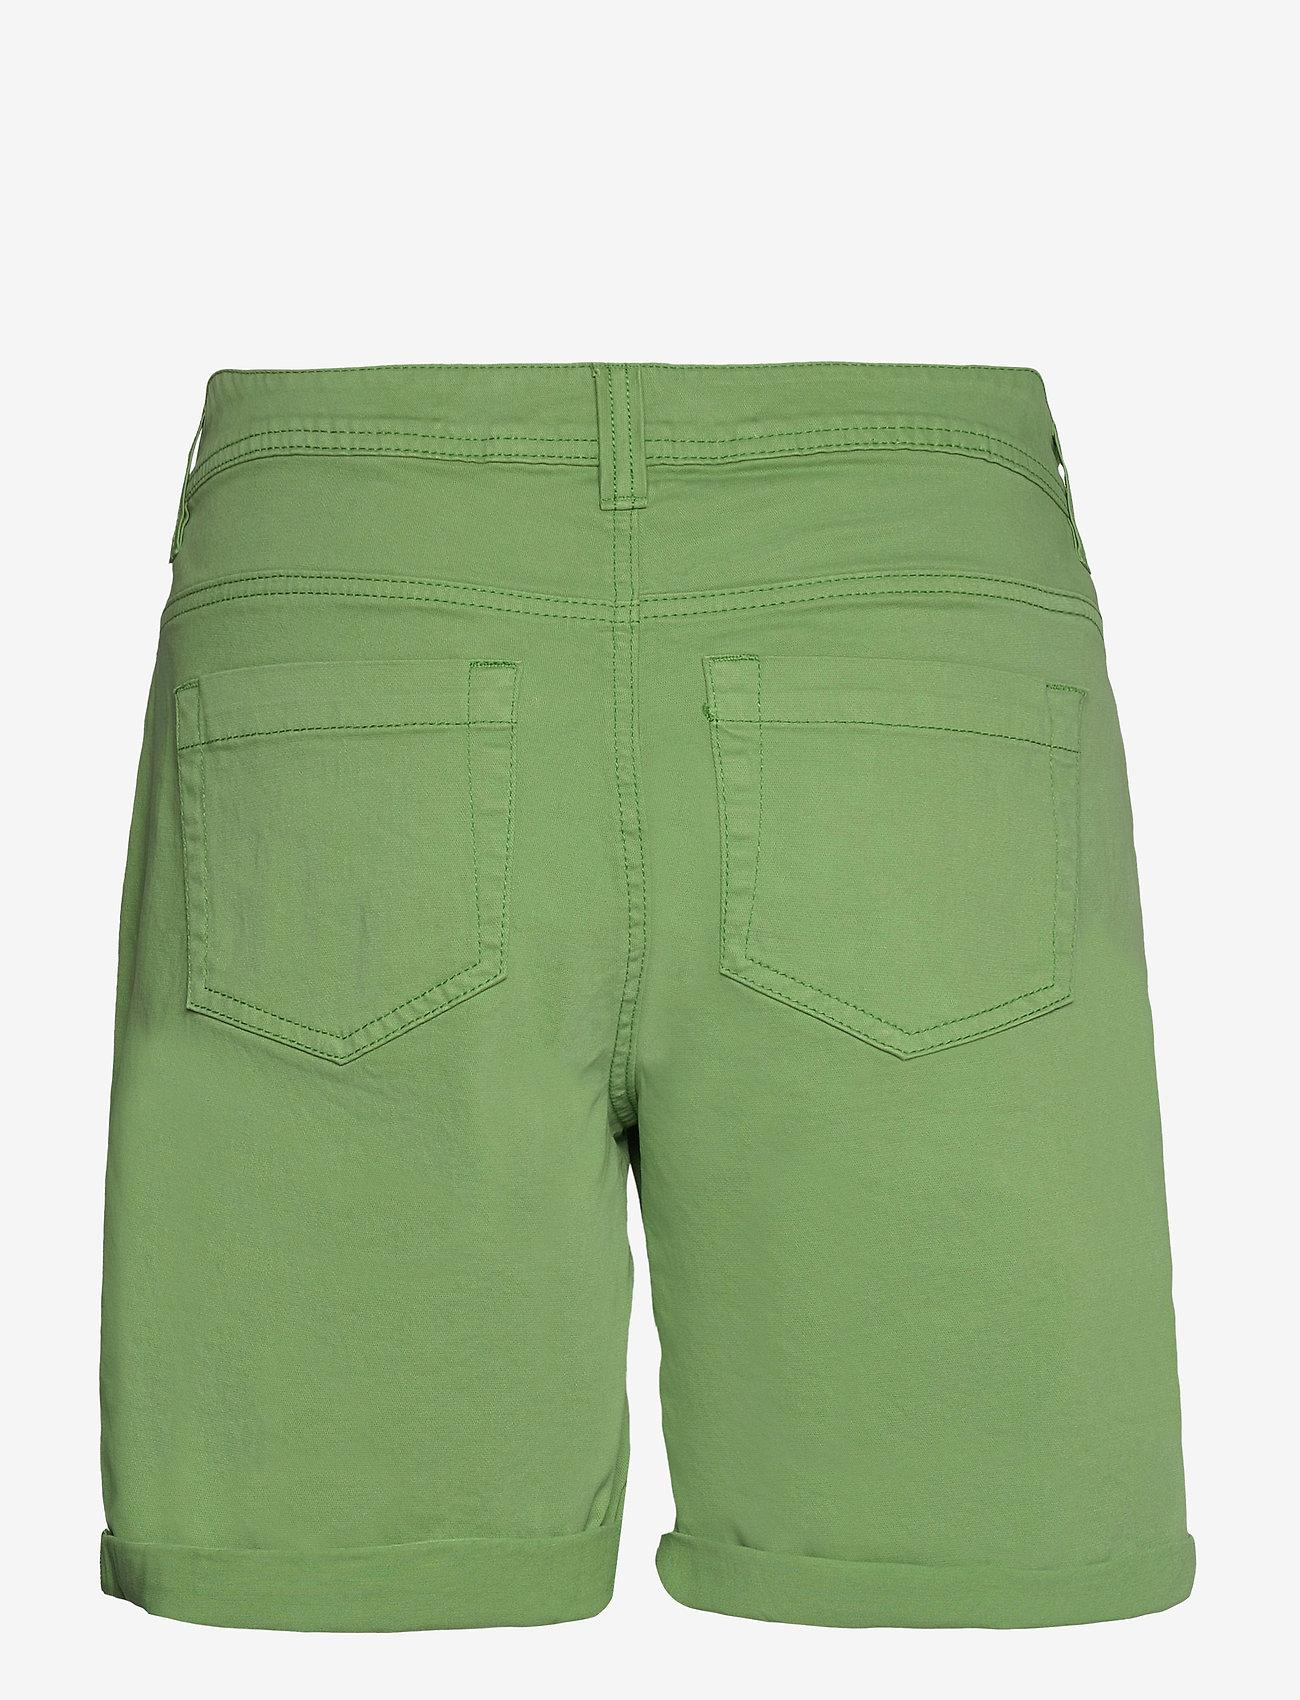 Tom Tailor - Tom Tailor A - bermudas - sundried turf green - 1